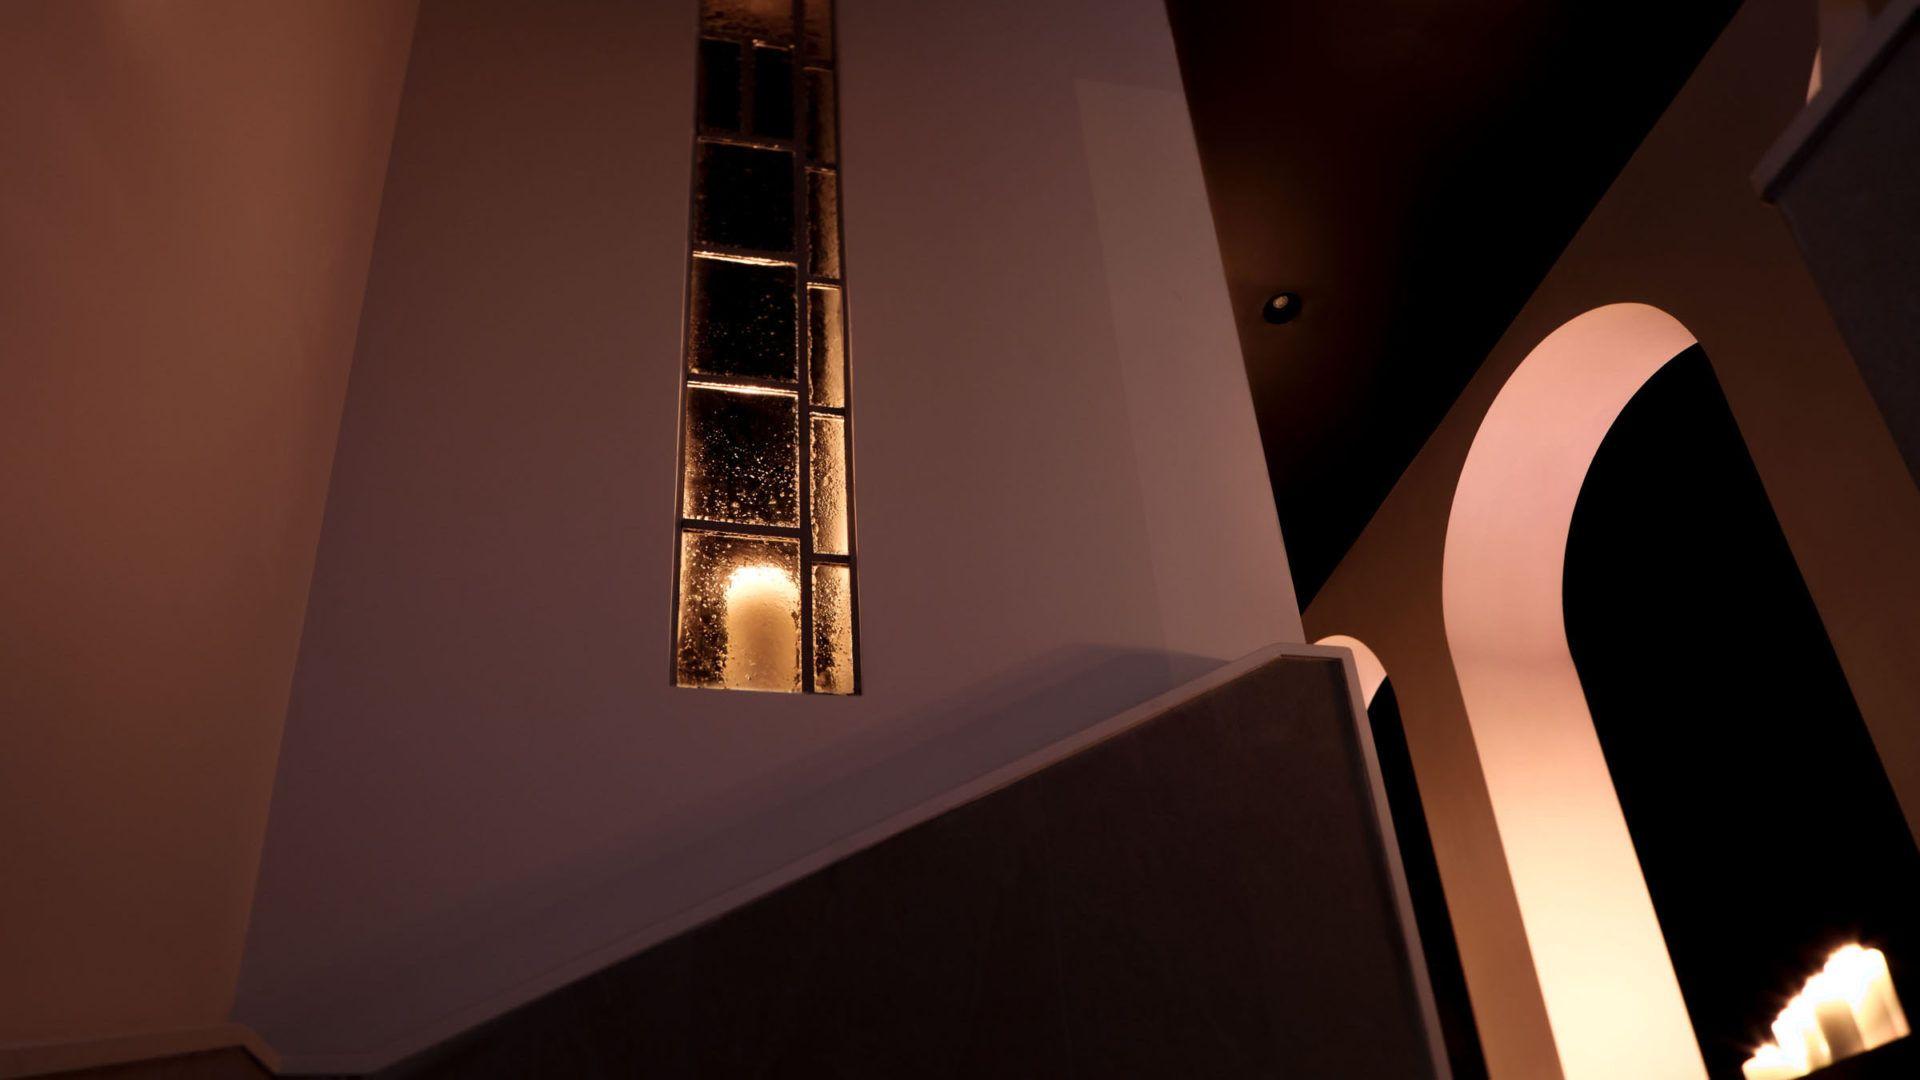 SINNER_Spa_marais_hotel_luxe_Nicolas_Receveur